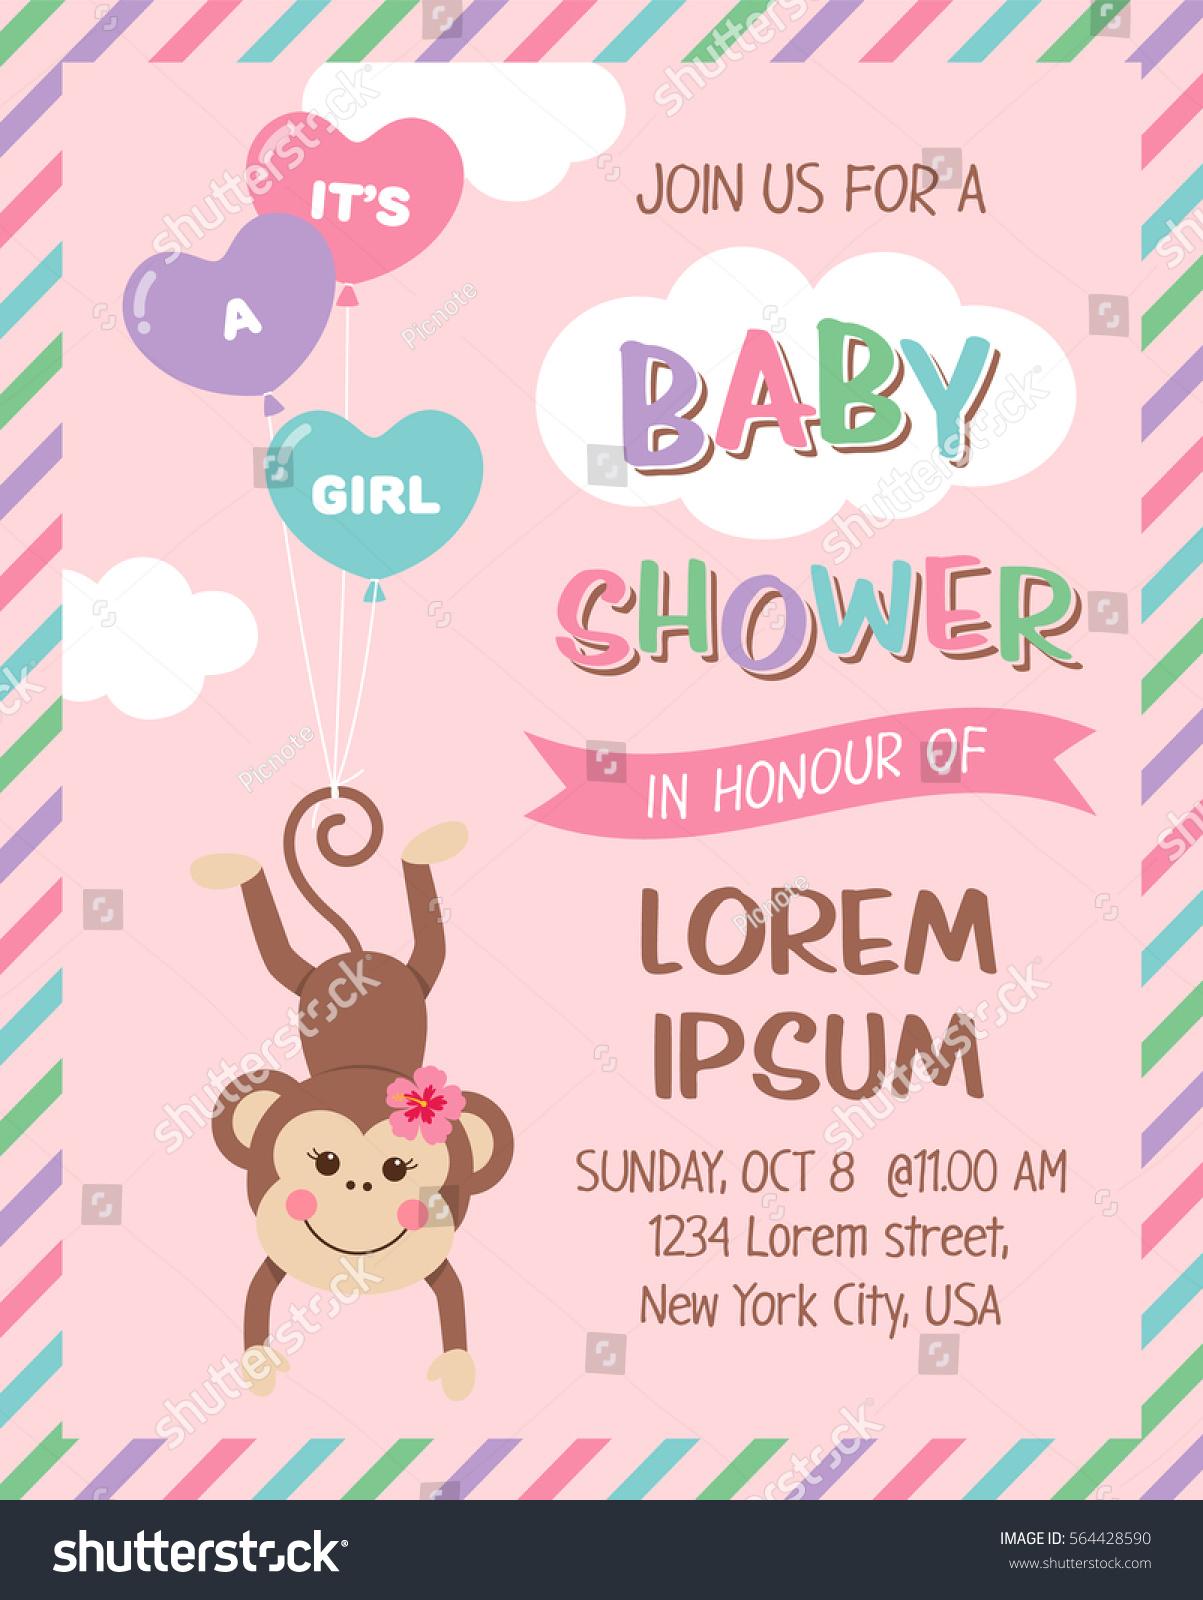 Cute Monkey Cartoon Illustration Baby Shower Stock Vector Royalty